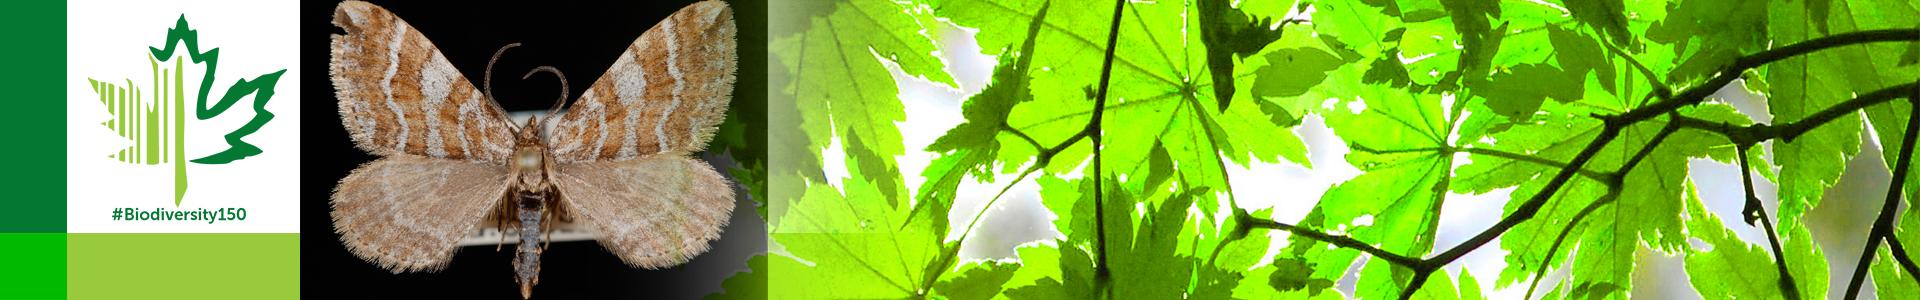 #Biodiversity150 number 148 of 150 Xanthorhoe clarkeata